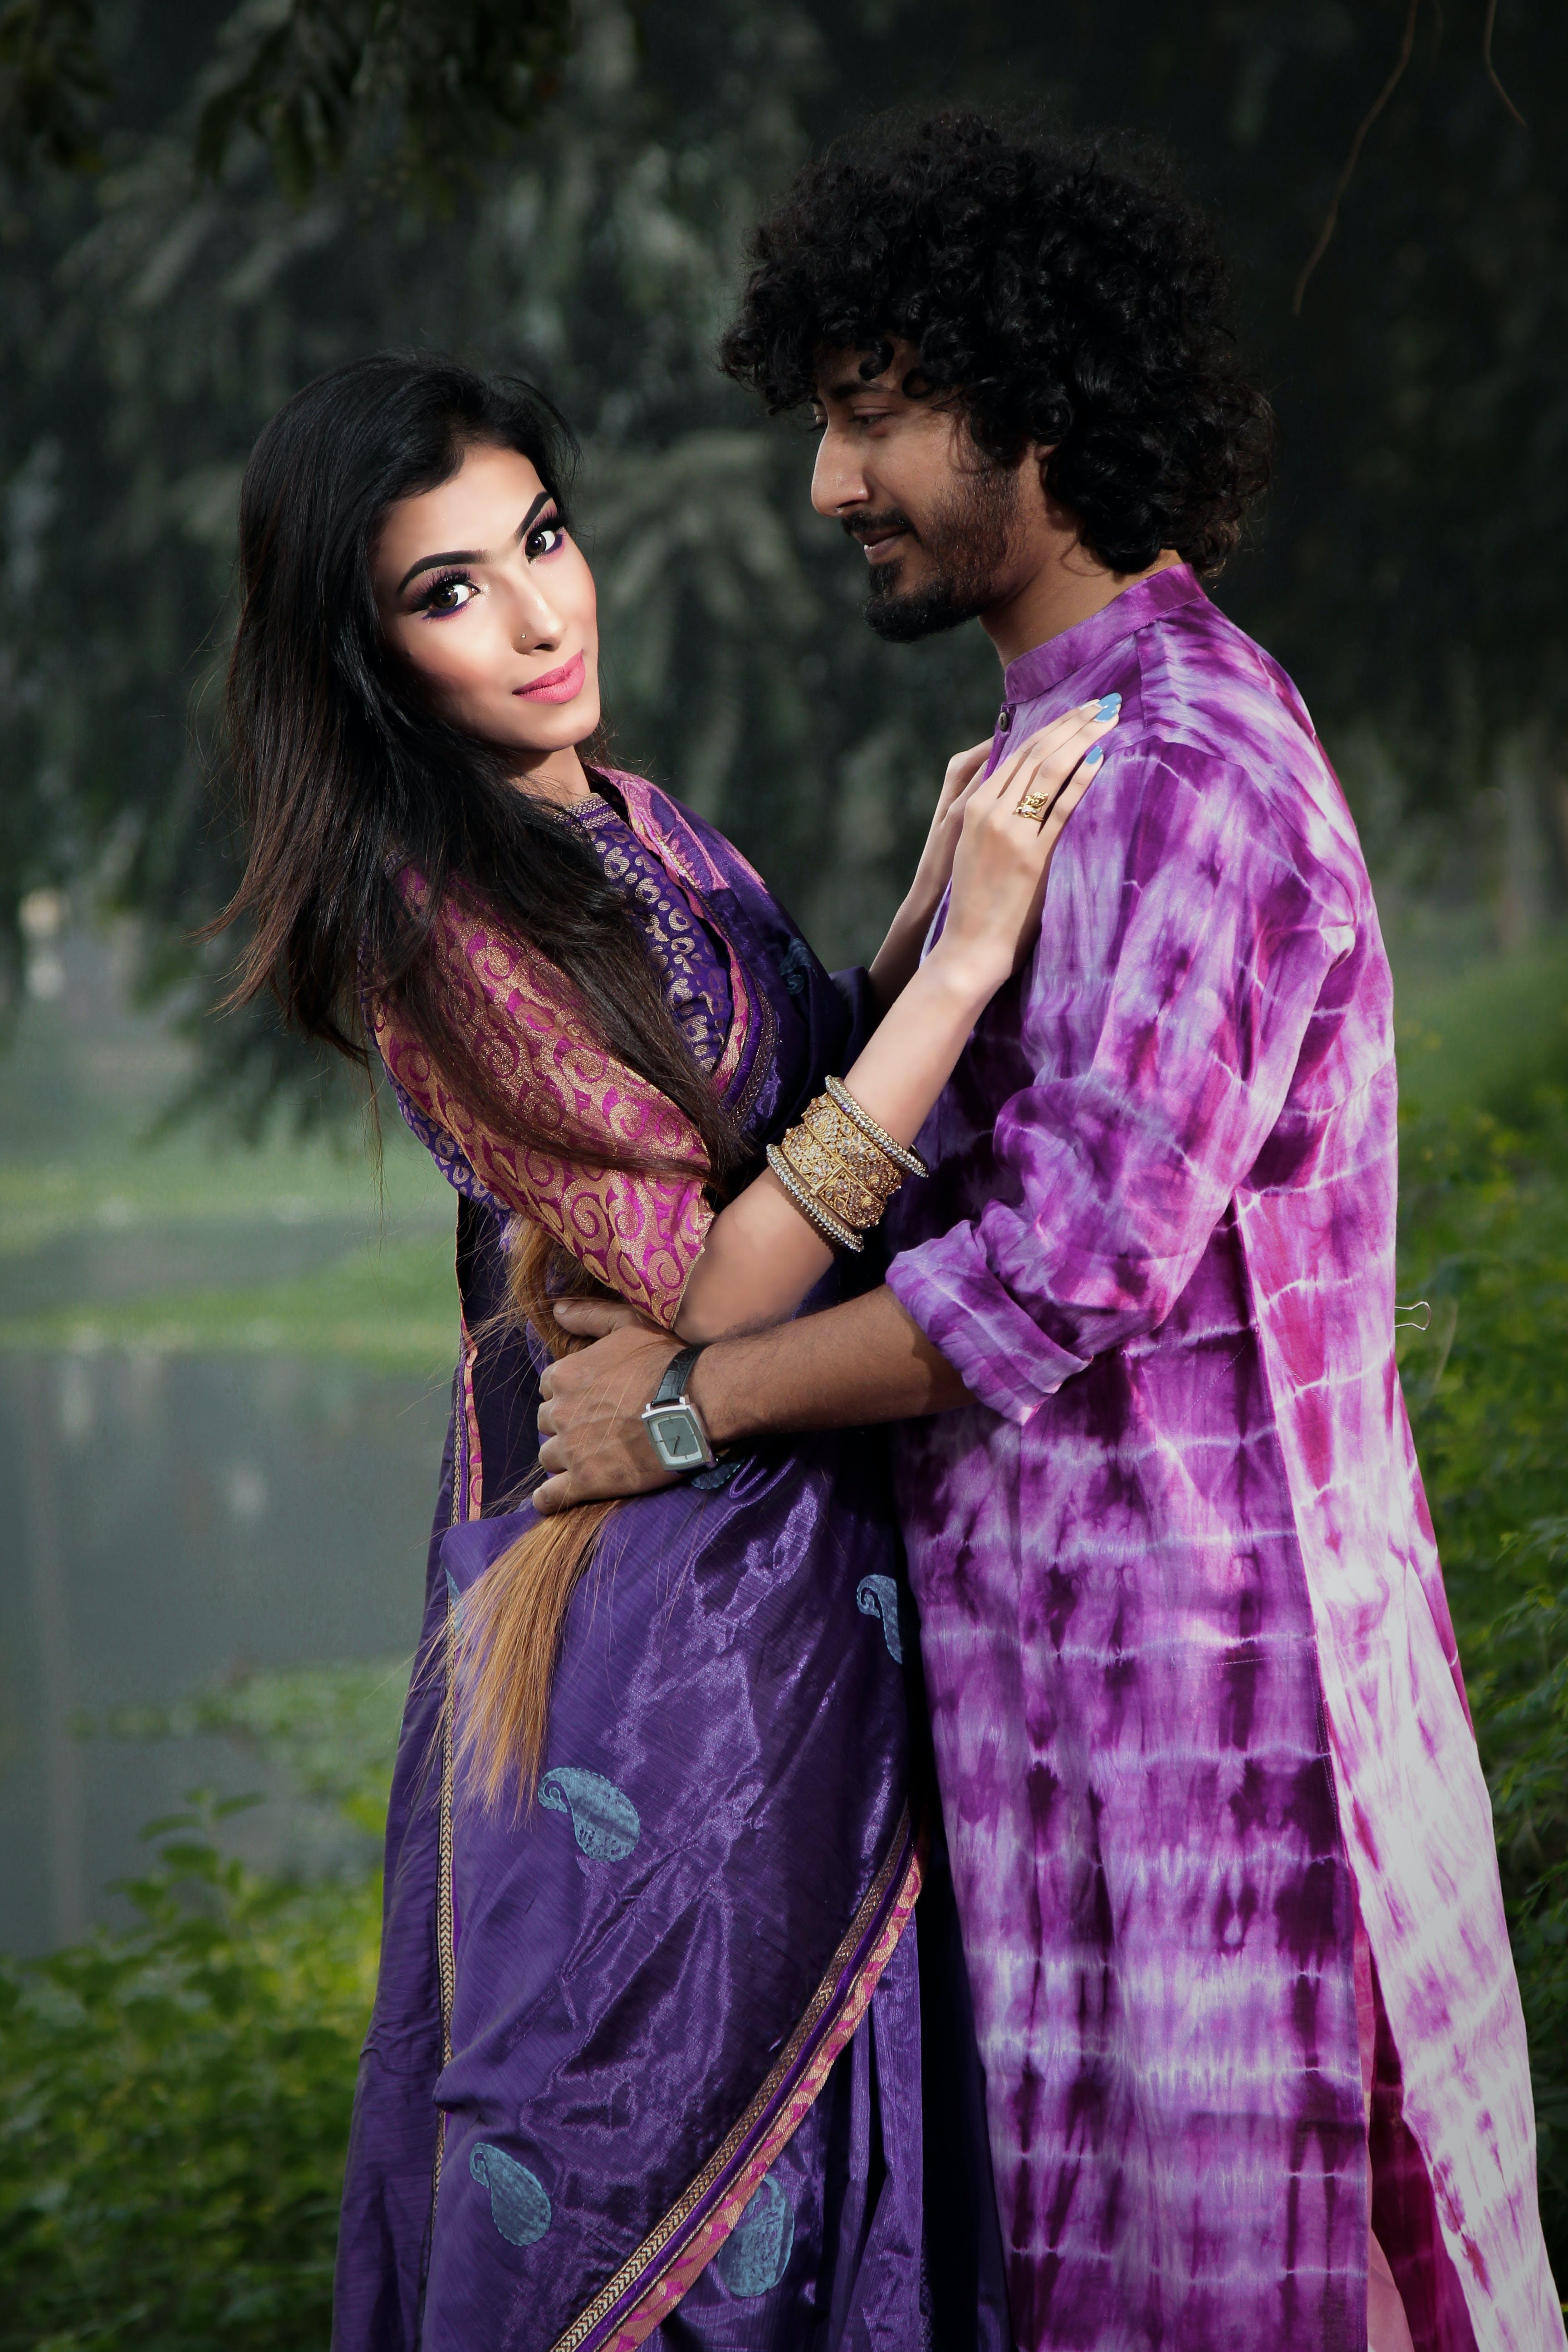 Photo of Man Holding Woman